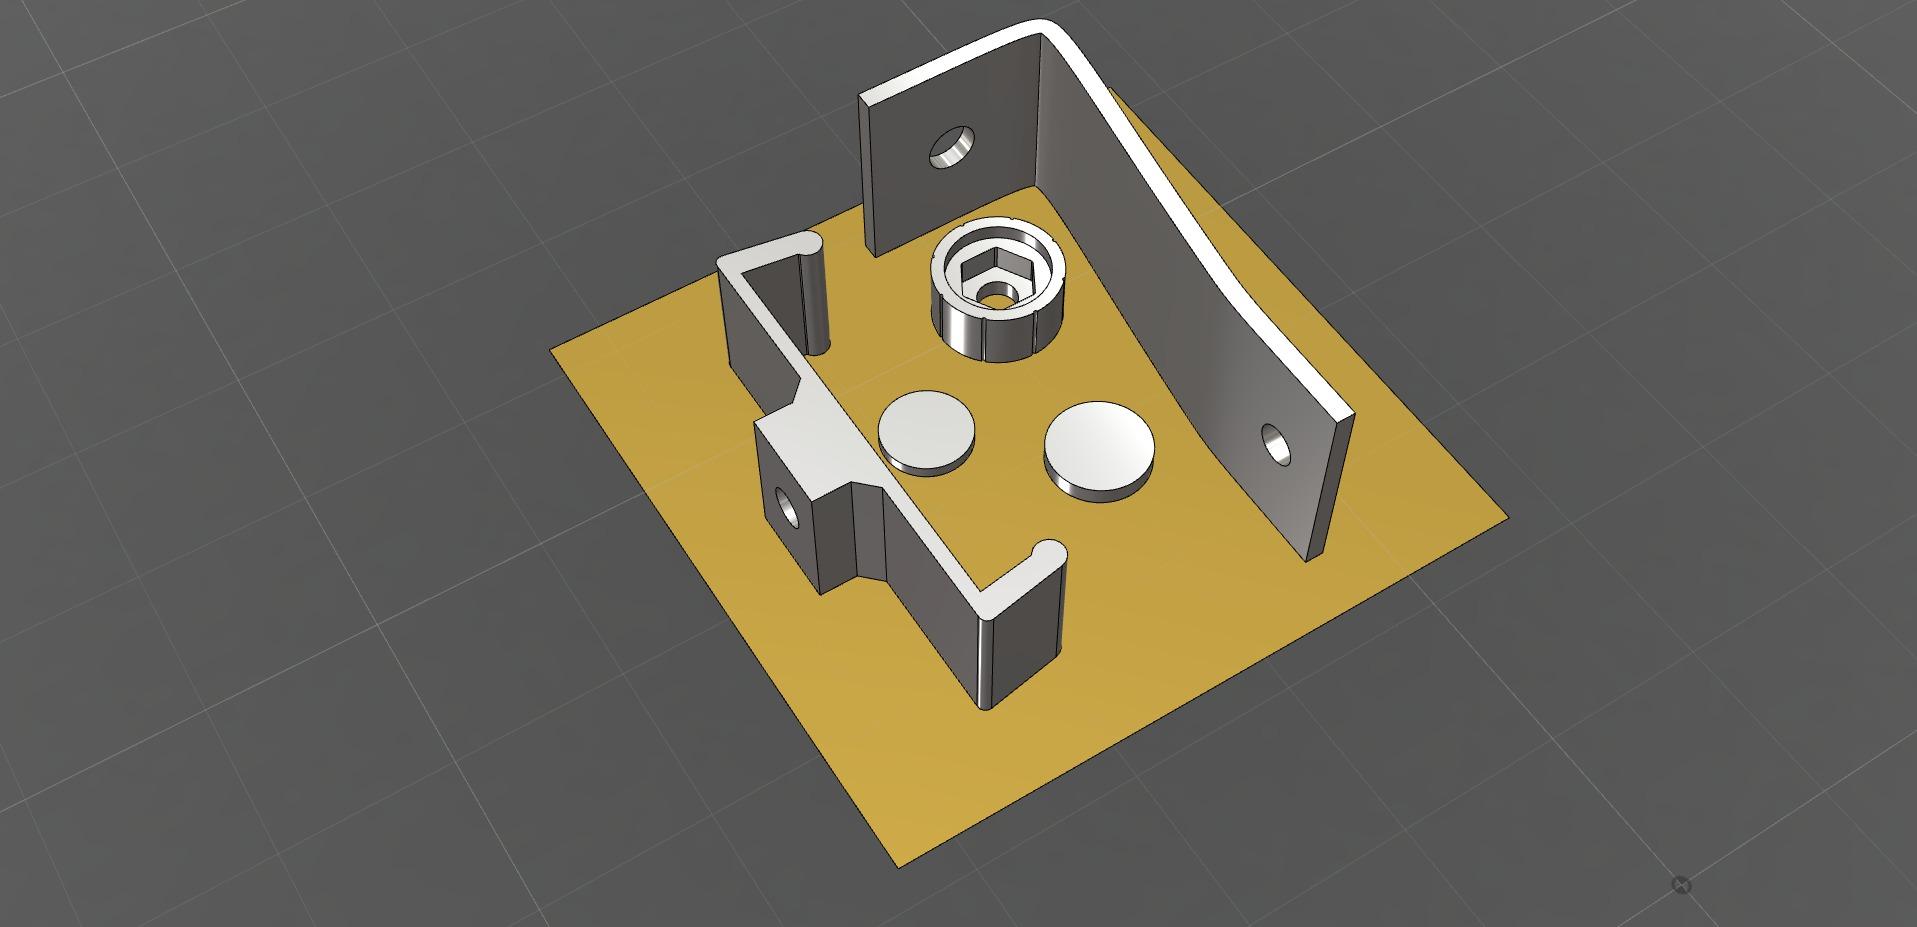 Tripod_adapter_3dprint_view